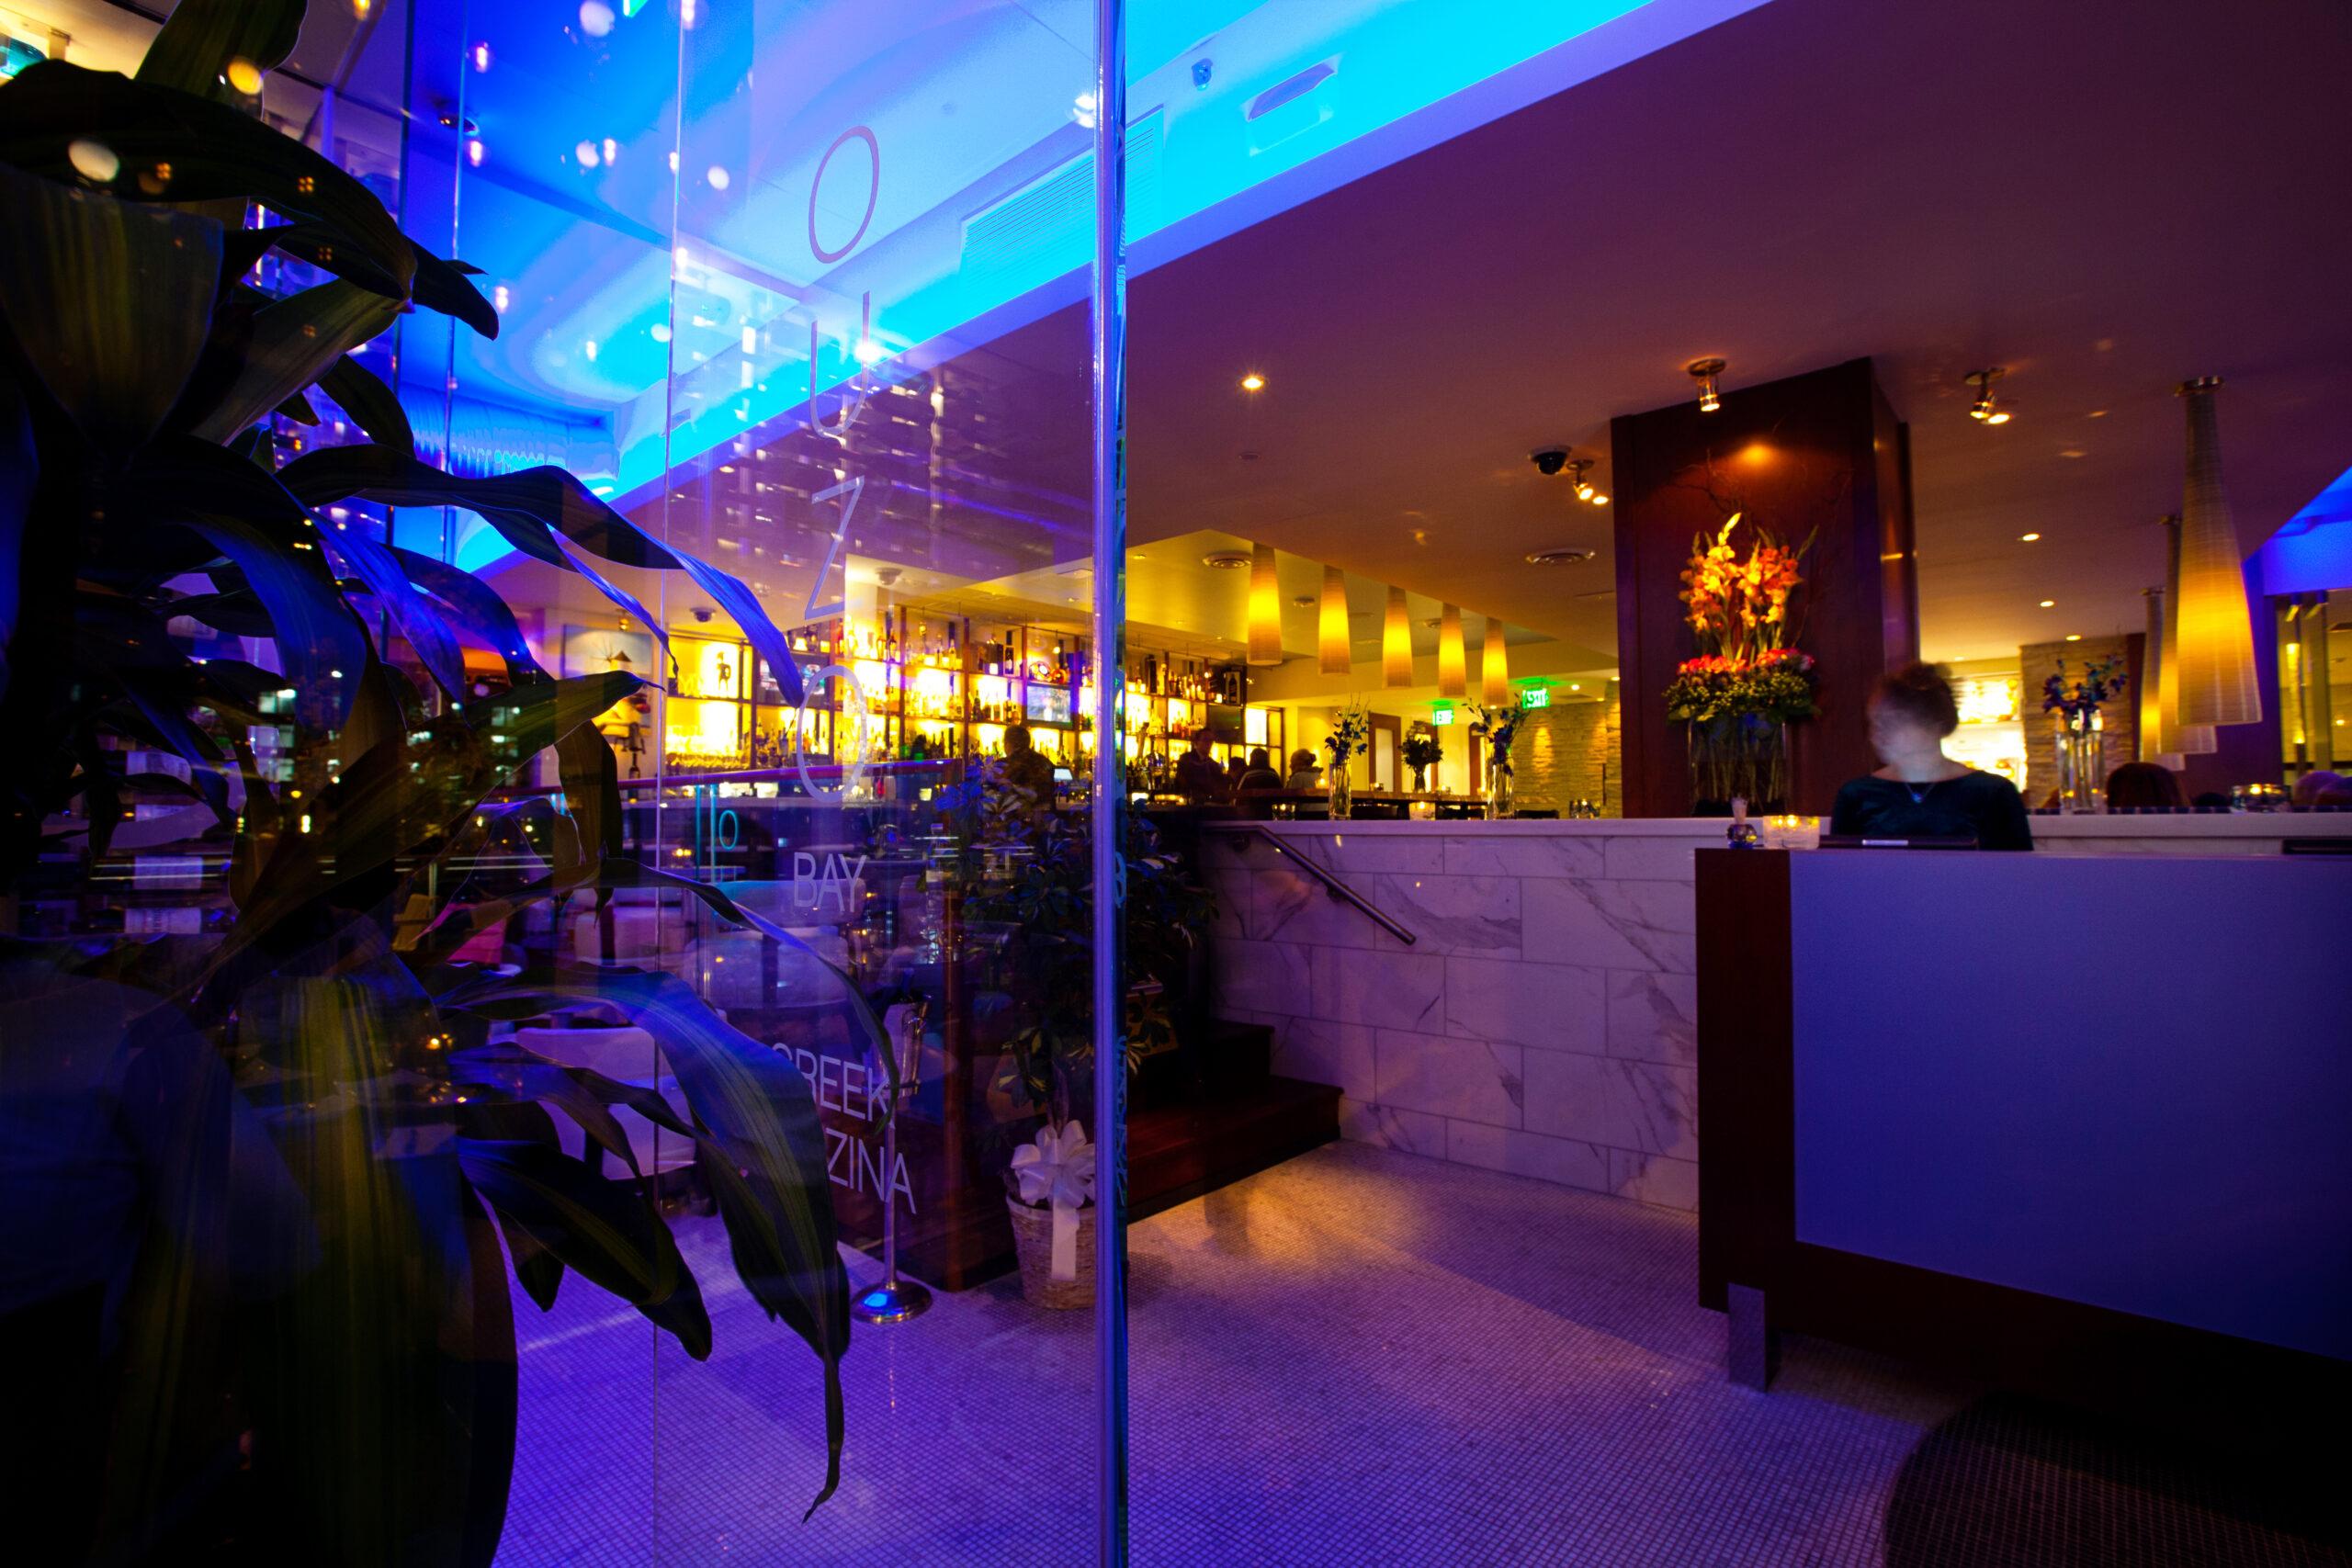 Restaurant entrance with blue lighting